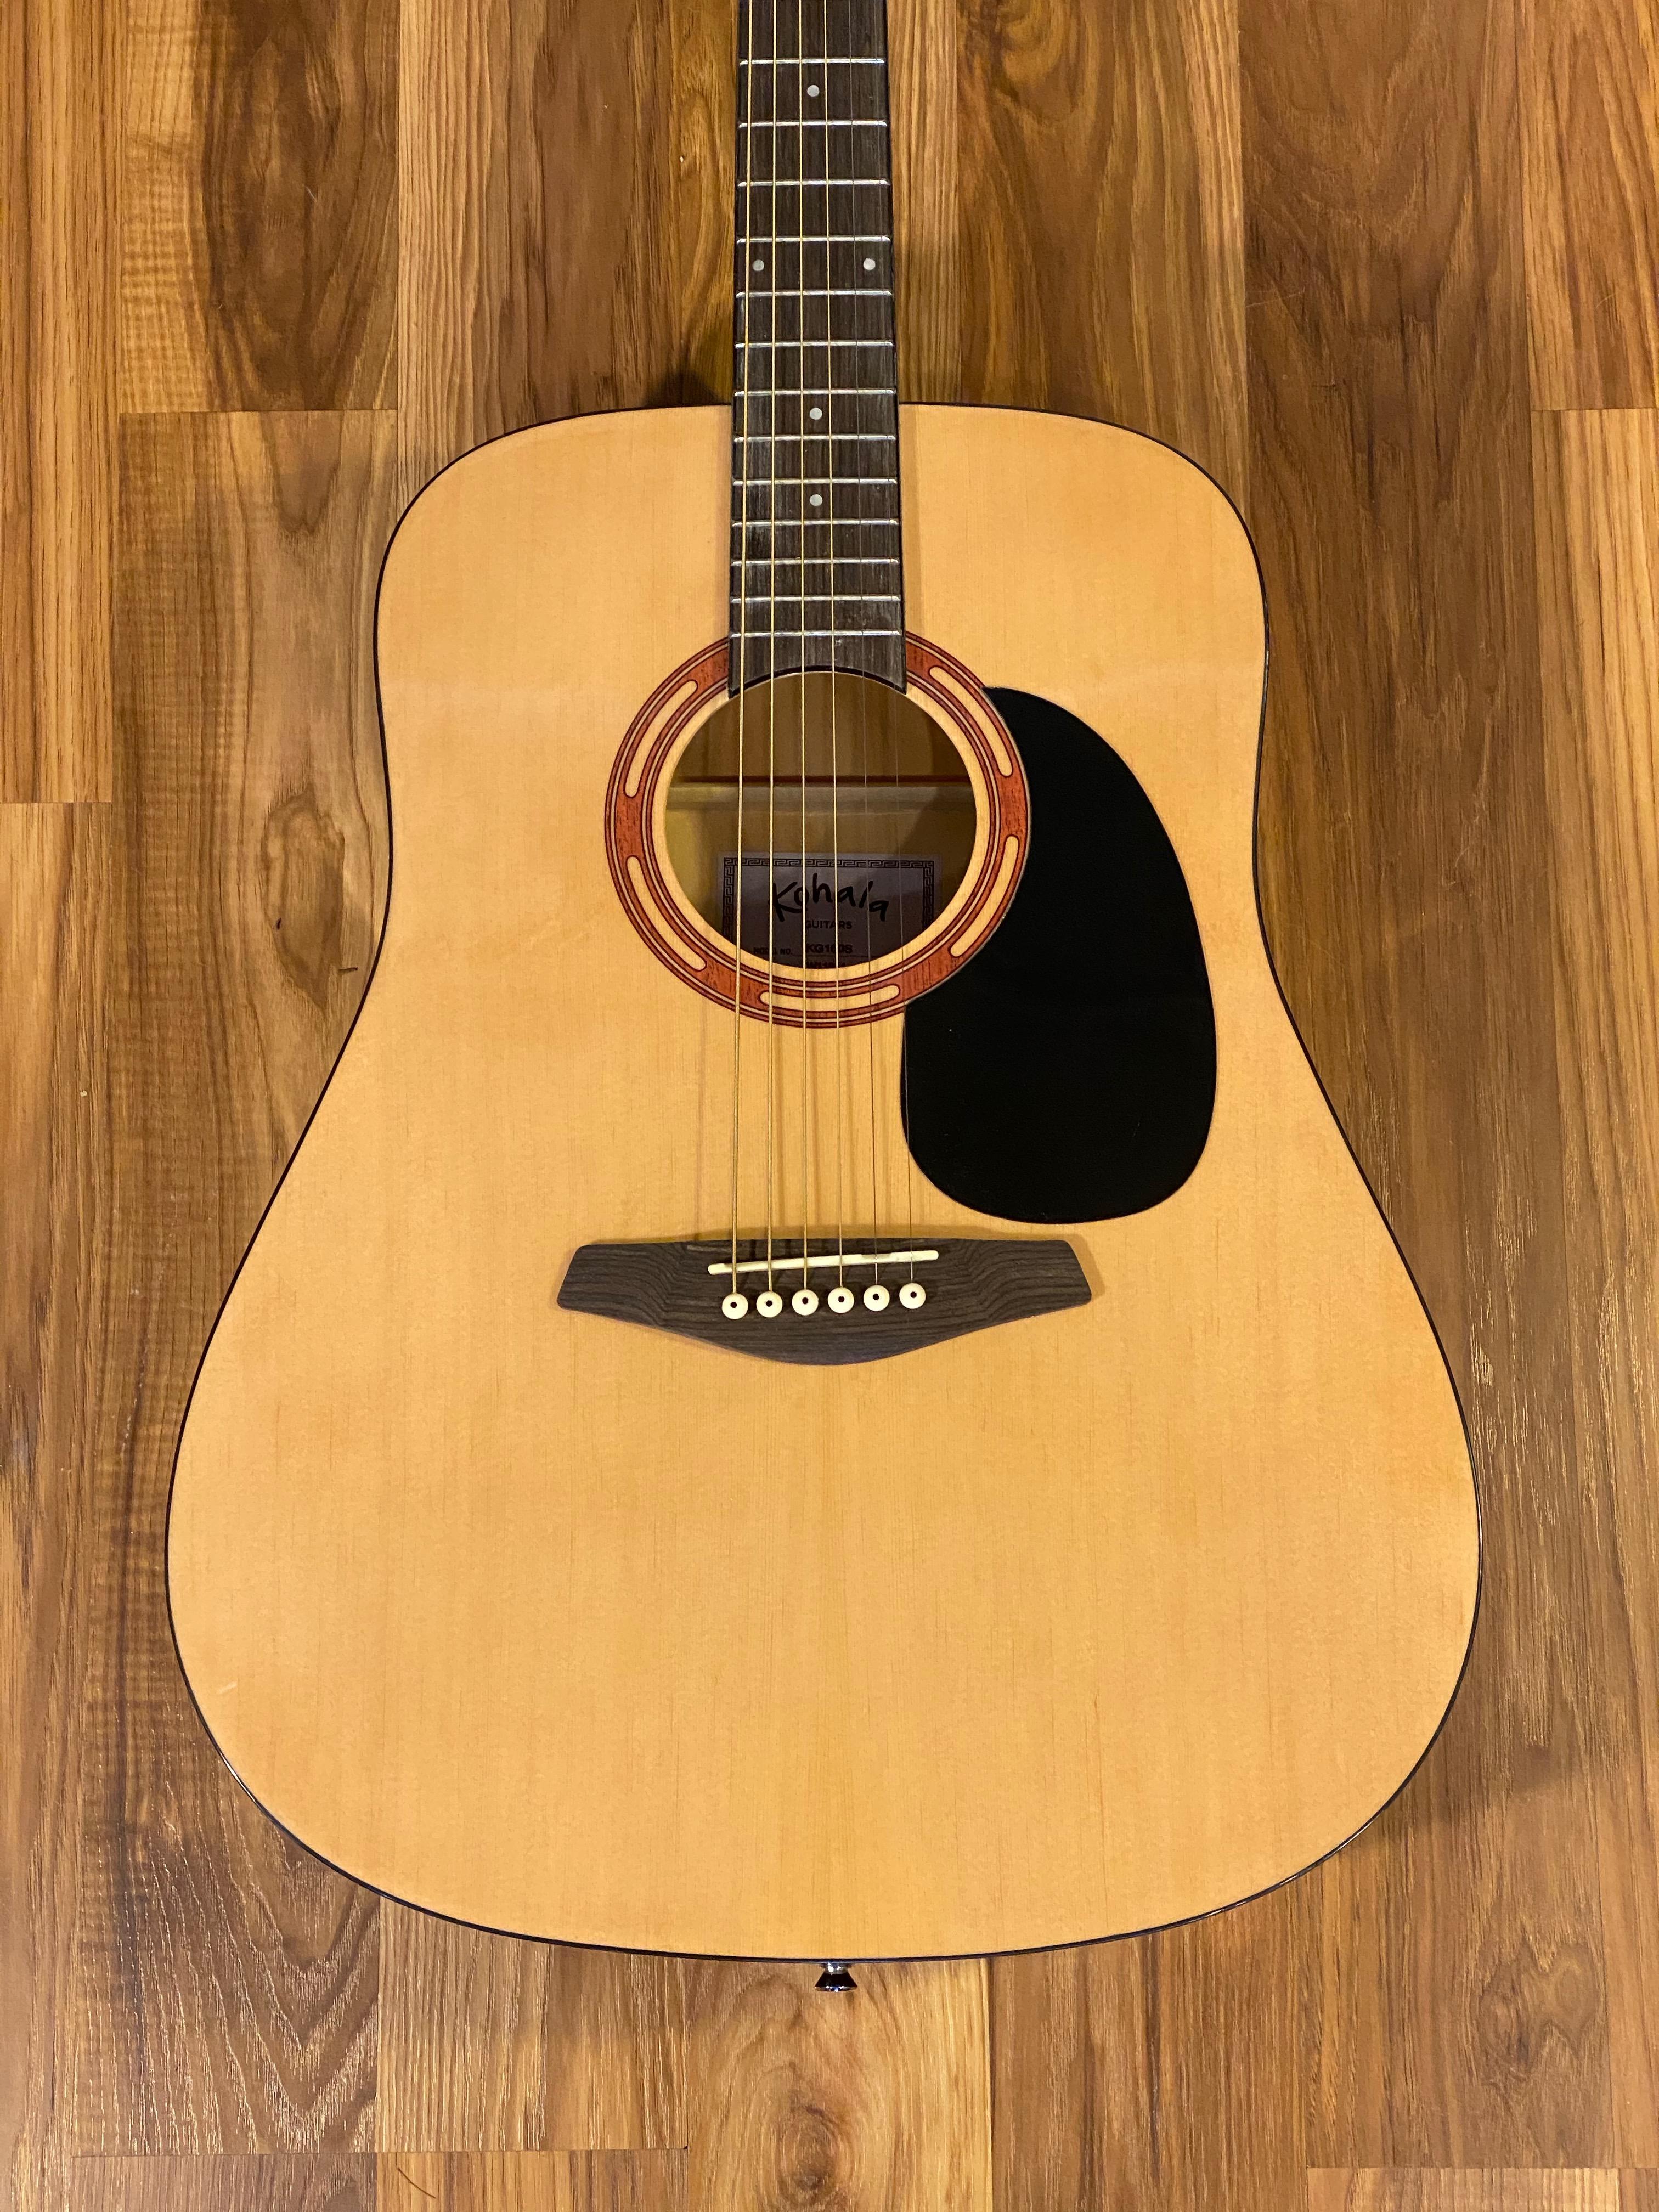 Kohala KD100S Acoustic Guitar/Gig bag Natural